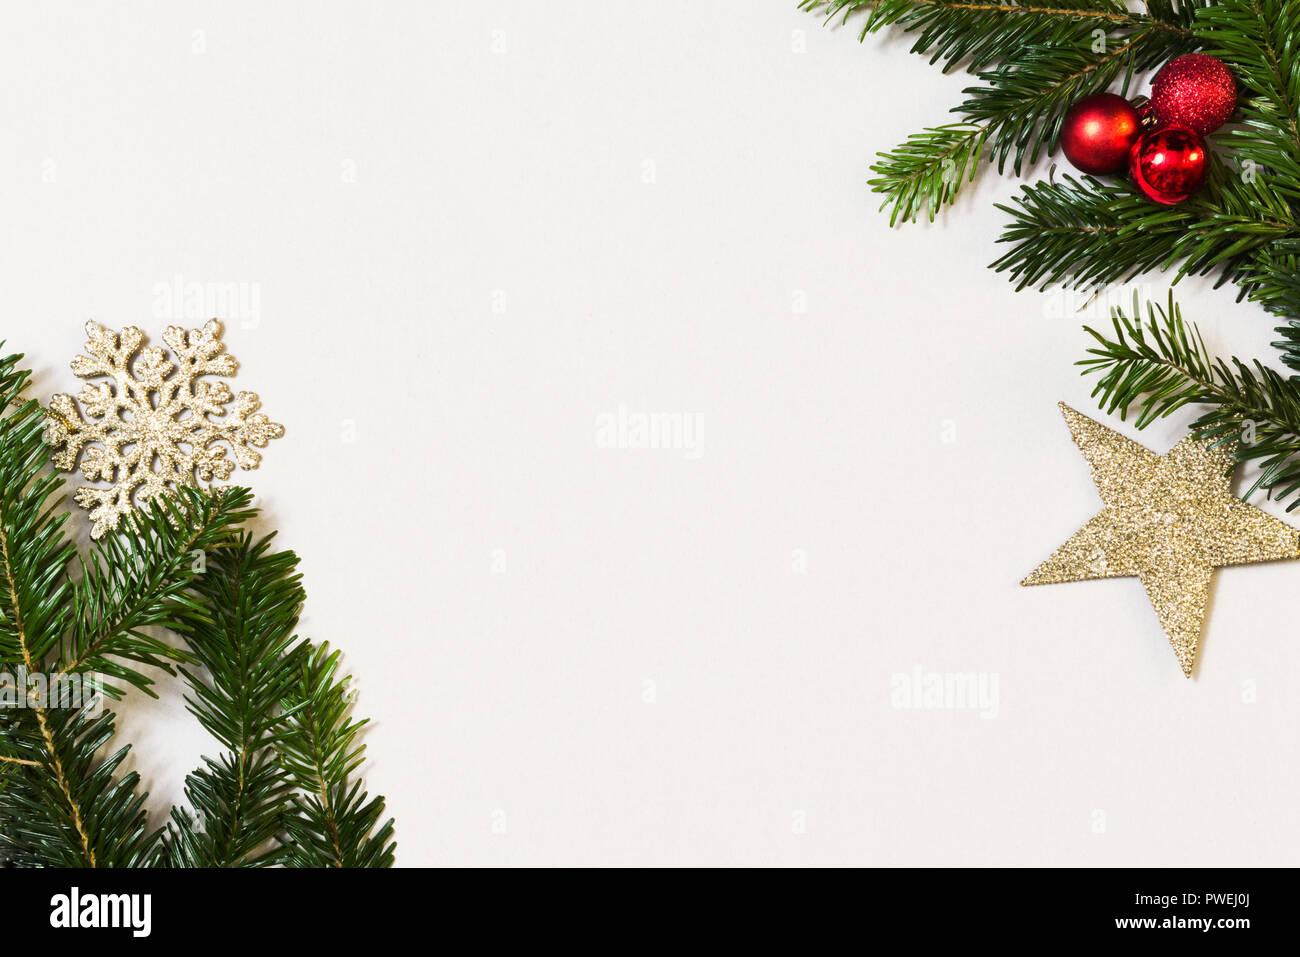 Christmas Messages Stockfotos & Christmas Messages Bilder - Alamy